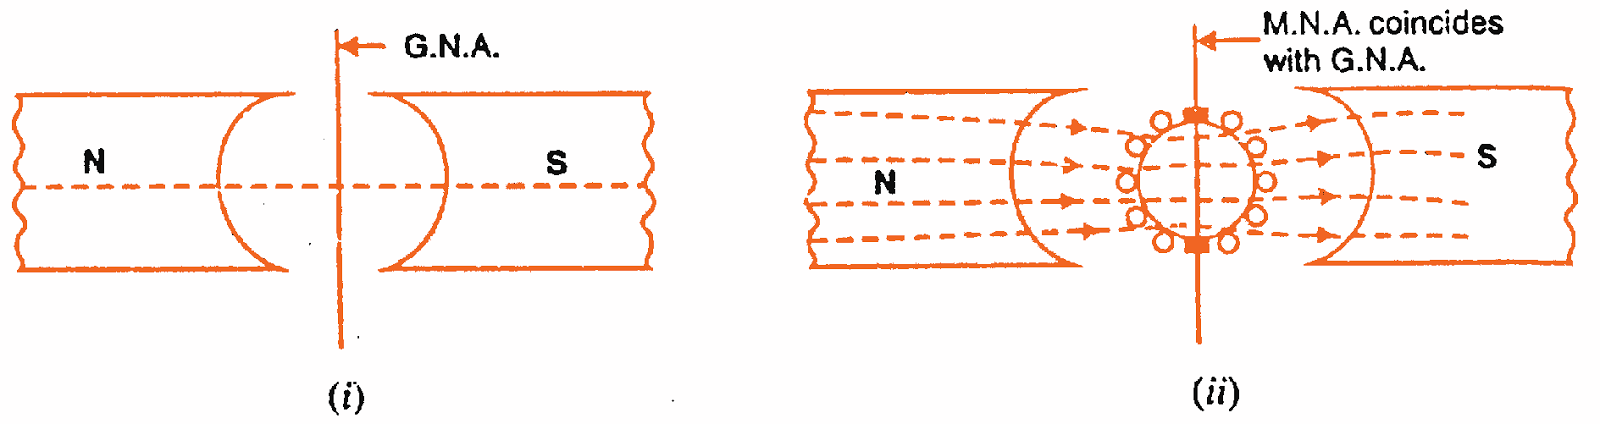 armature reaction in dc generator studyelectrical online  : reaction diagram generator - findchart.co